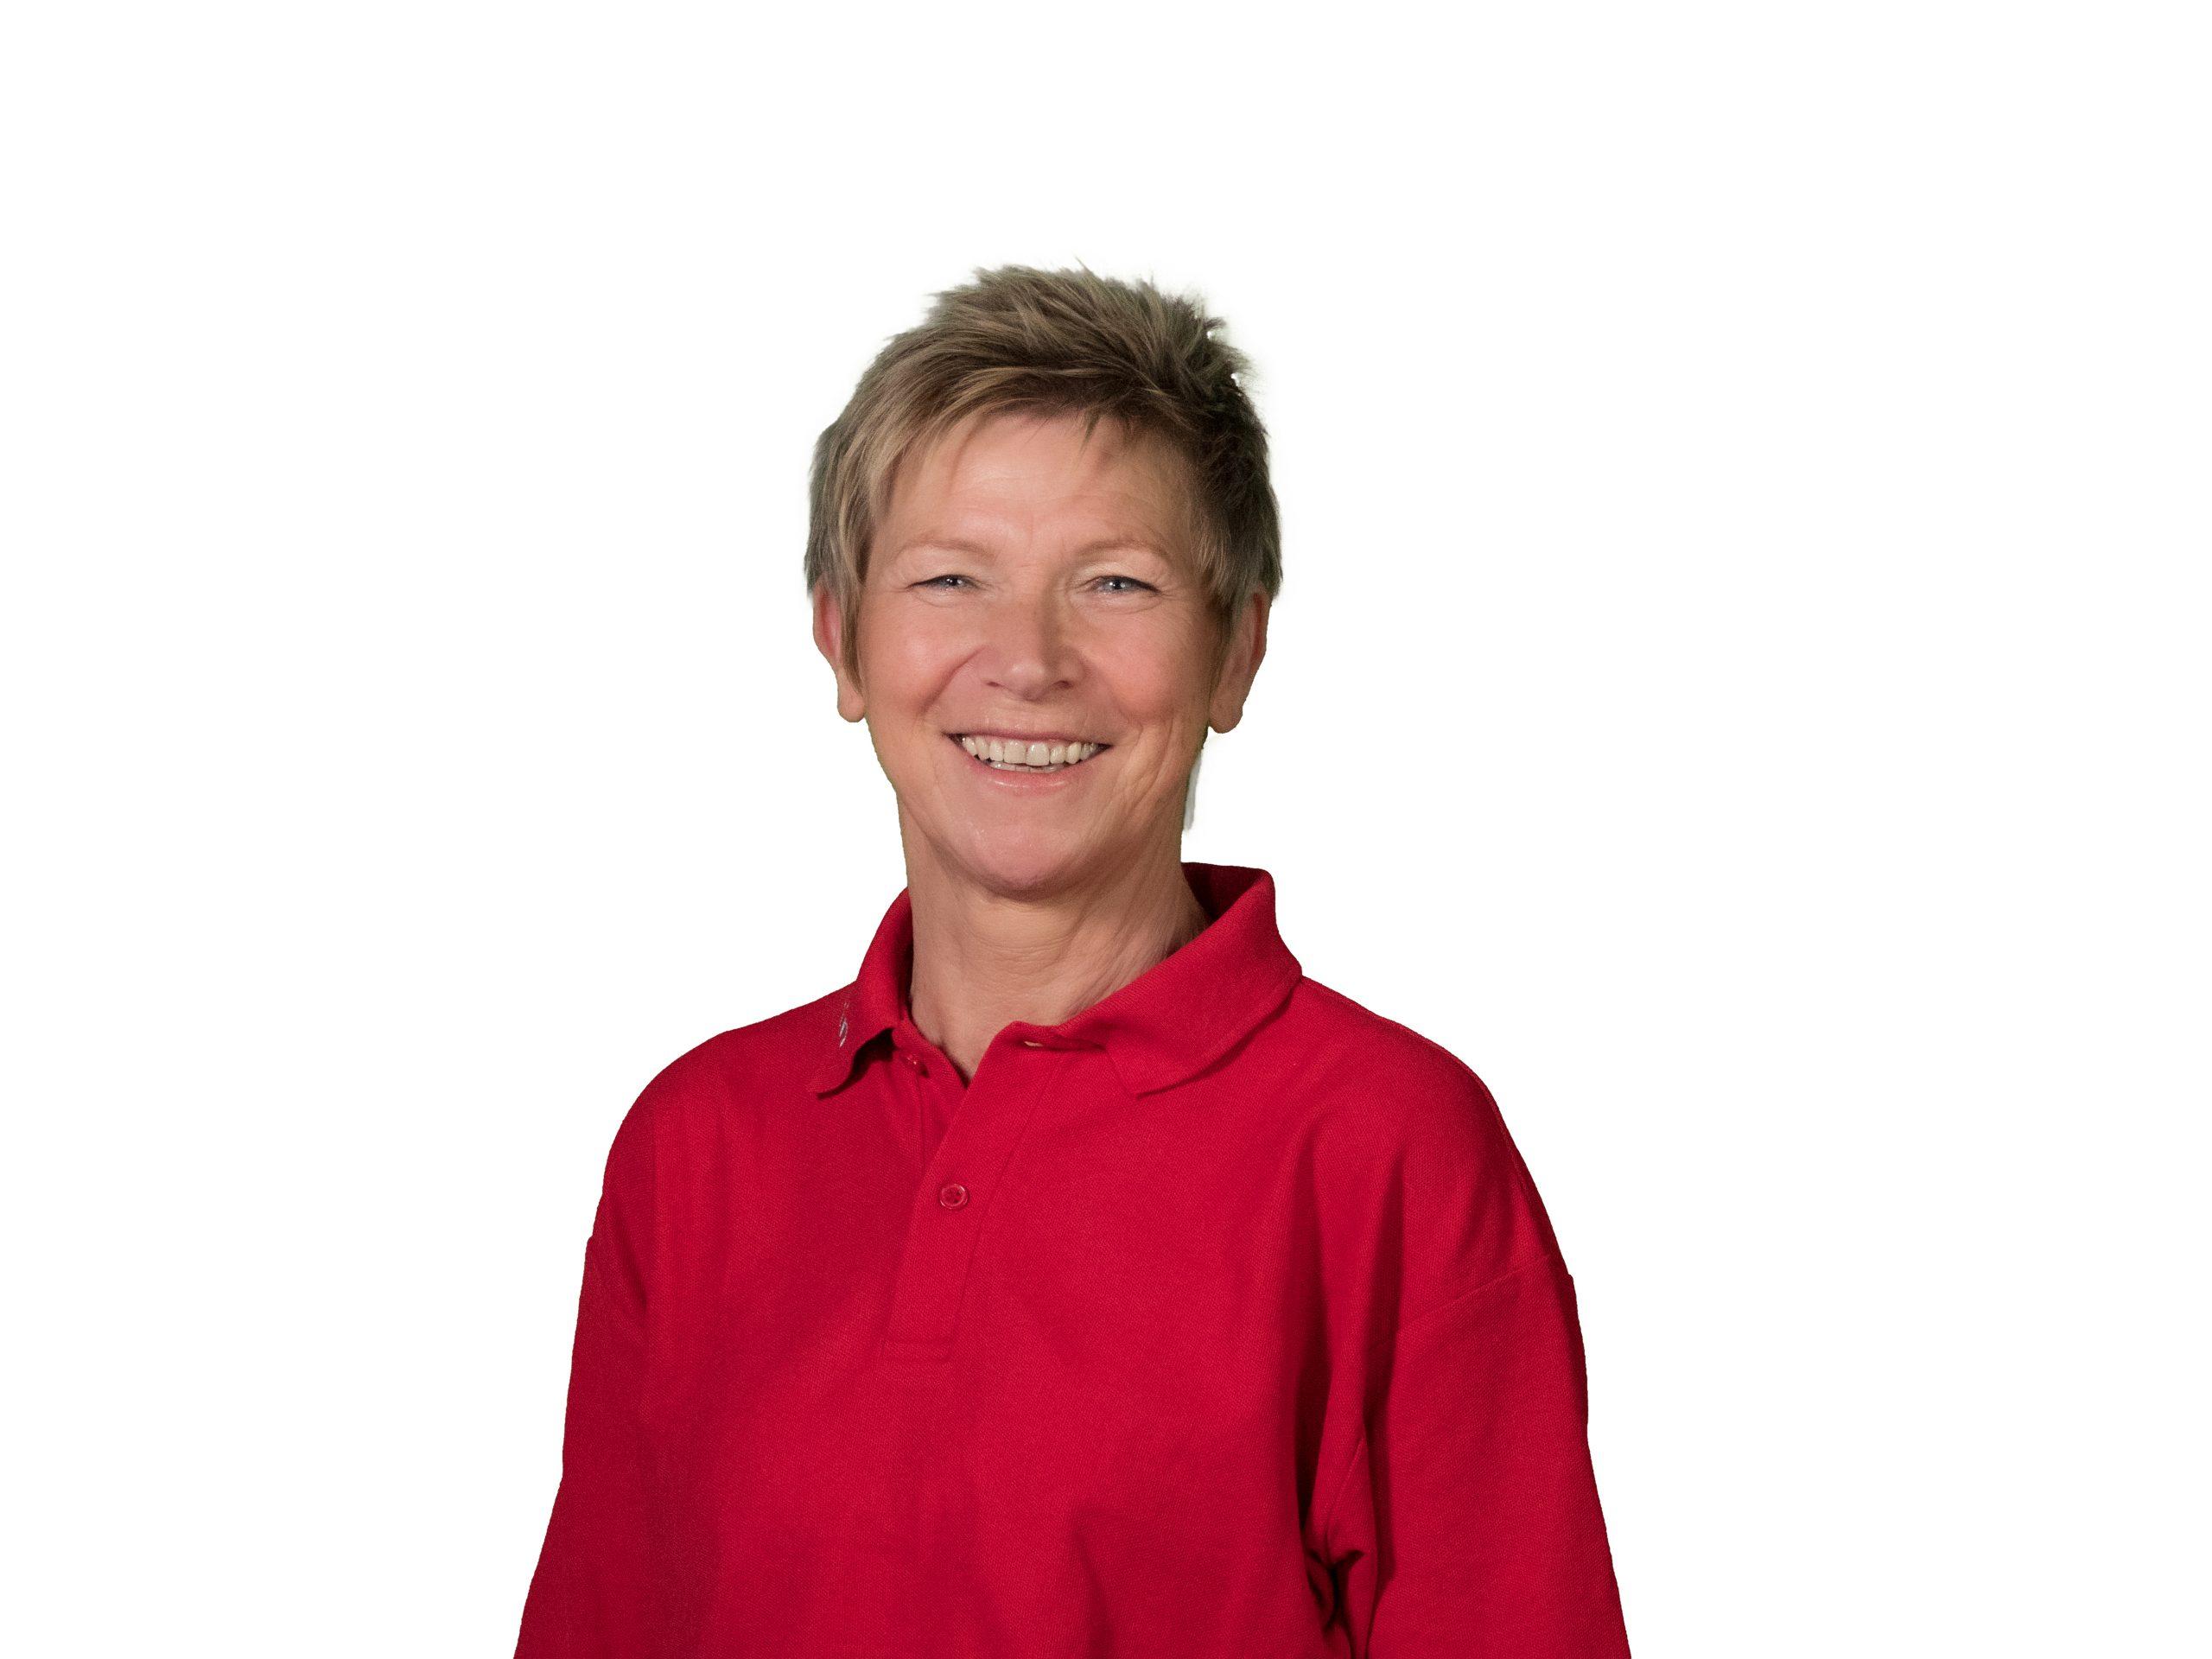 Karin Kerwien-Lütjerath